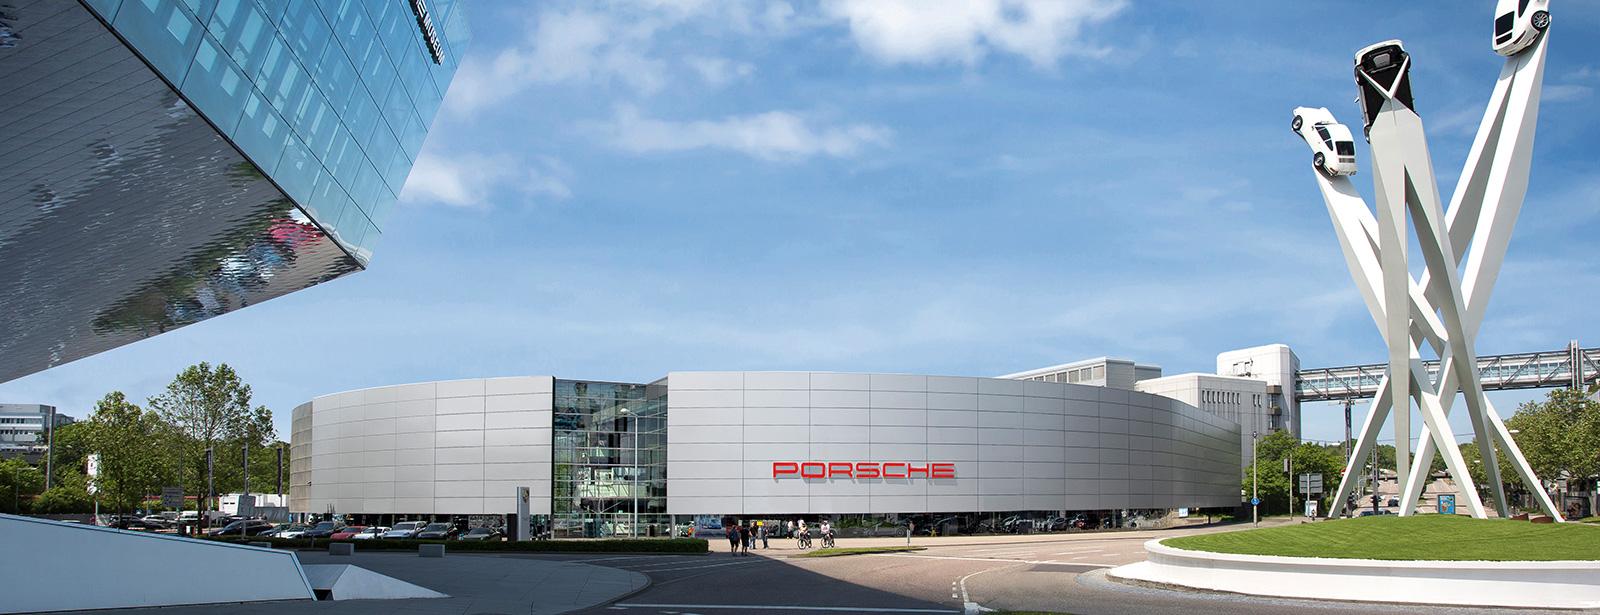 Porsche Zentrum Stuttgart 187 Bienvenue